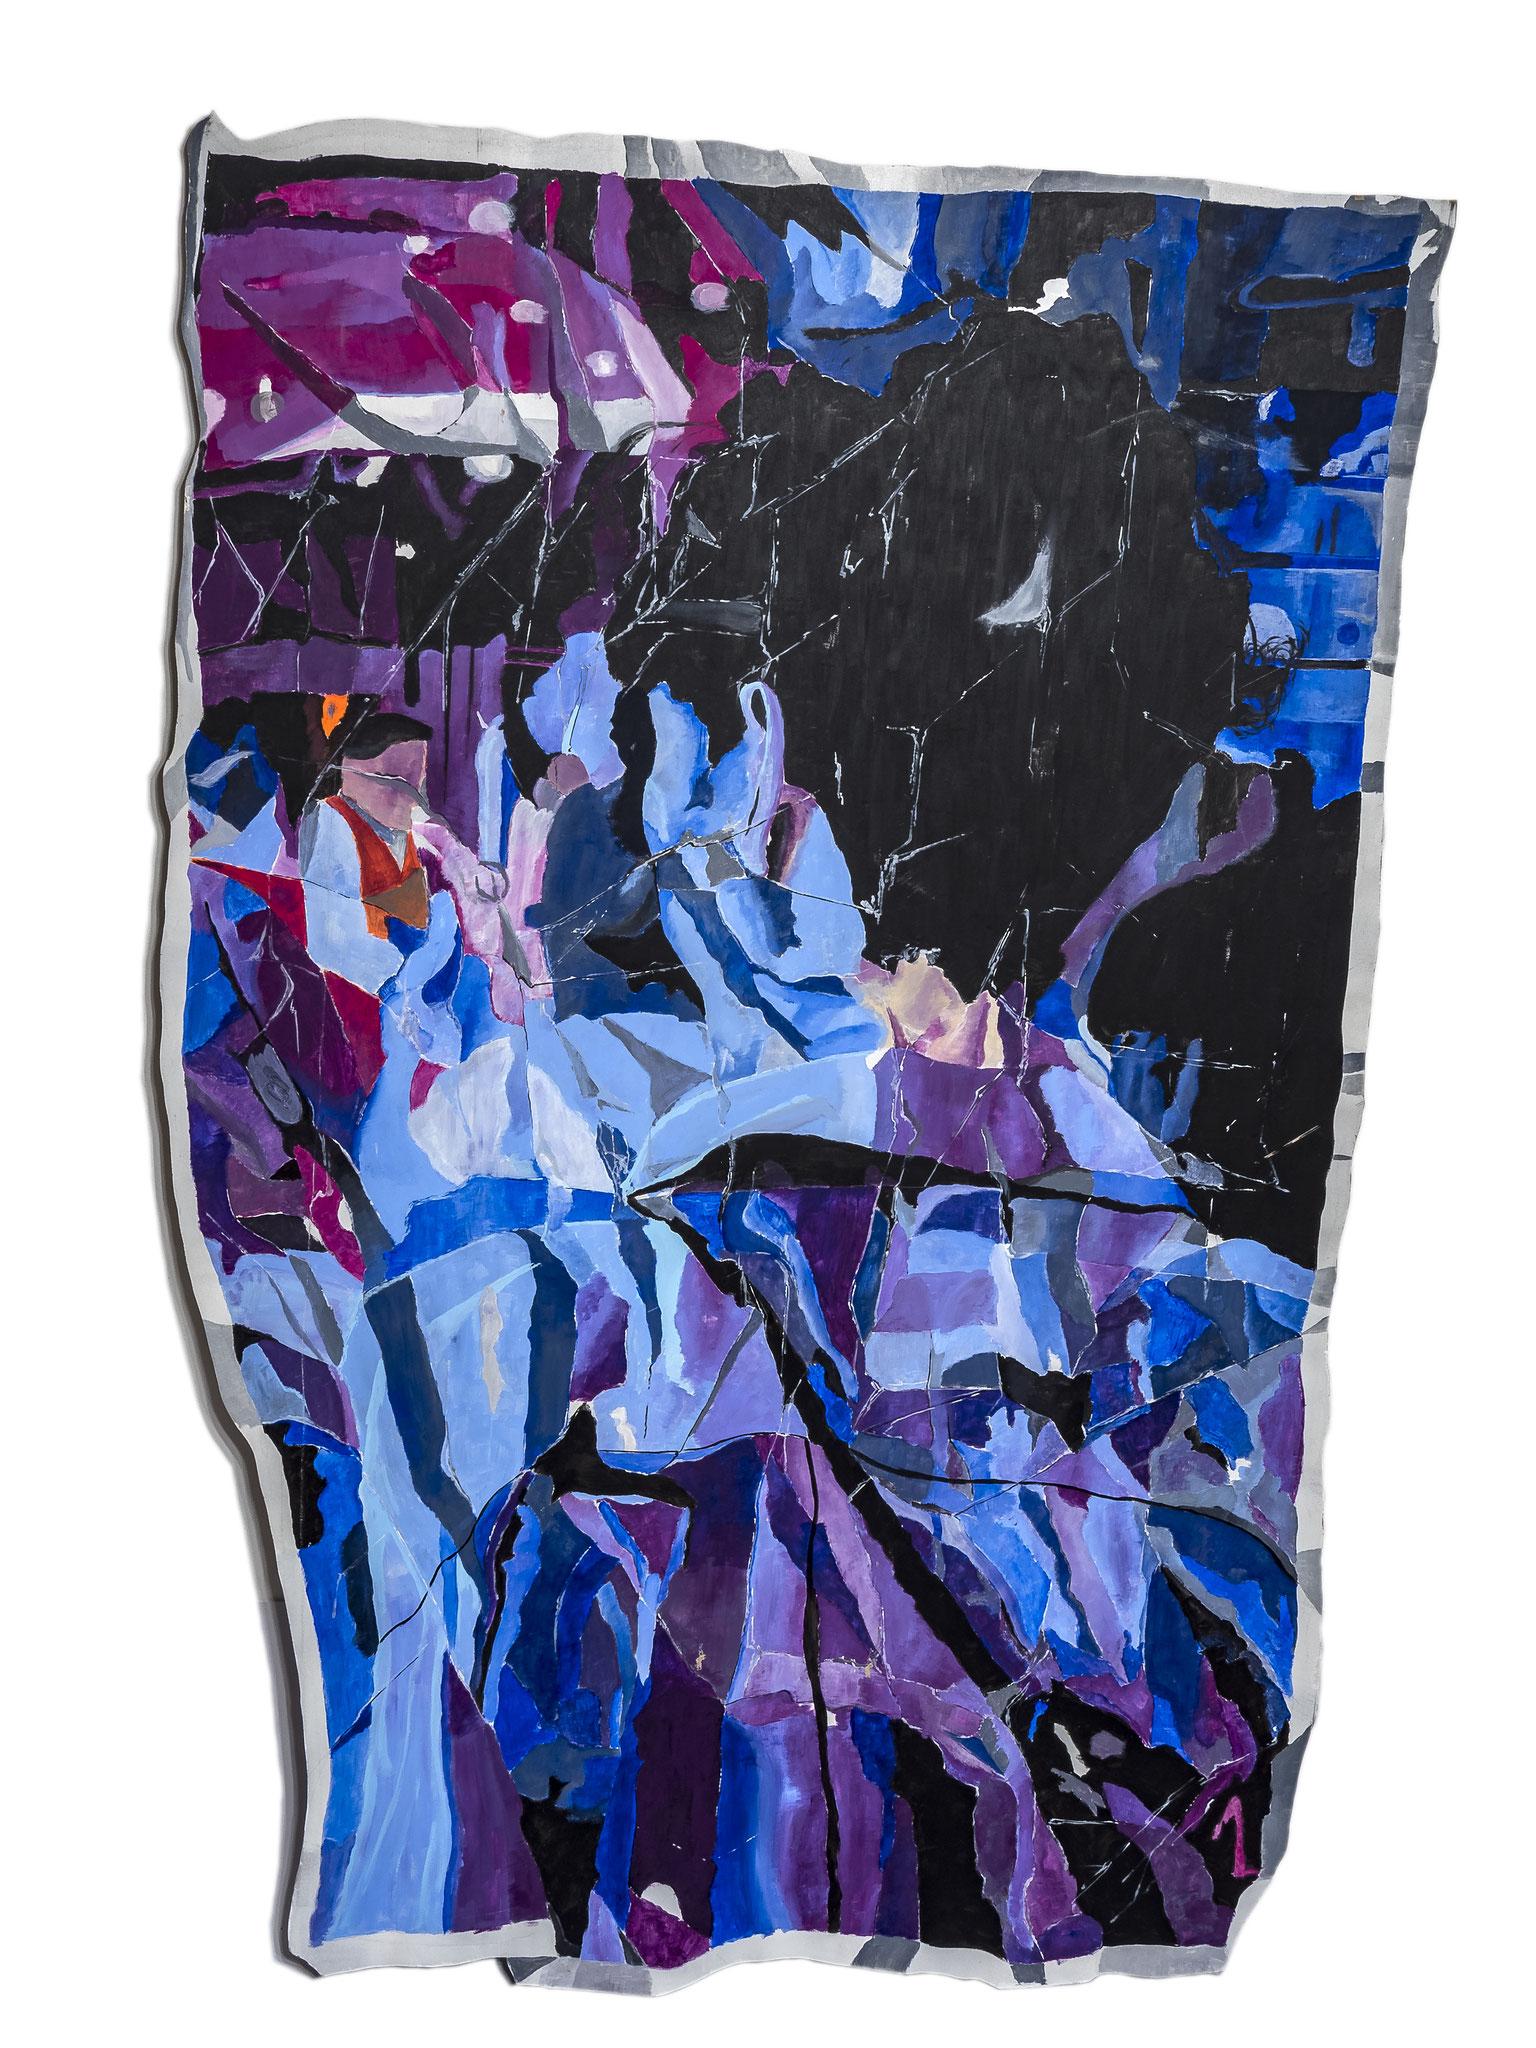 Spectre - 2019 - 185cm x 130cm - sold